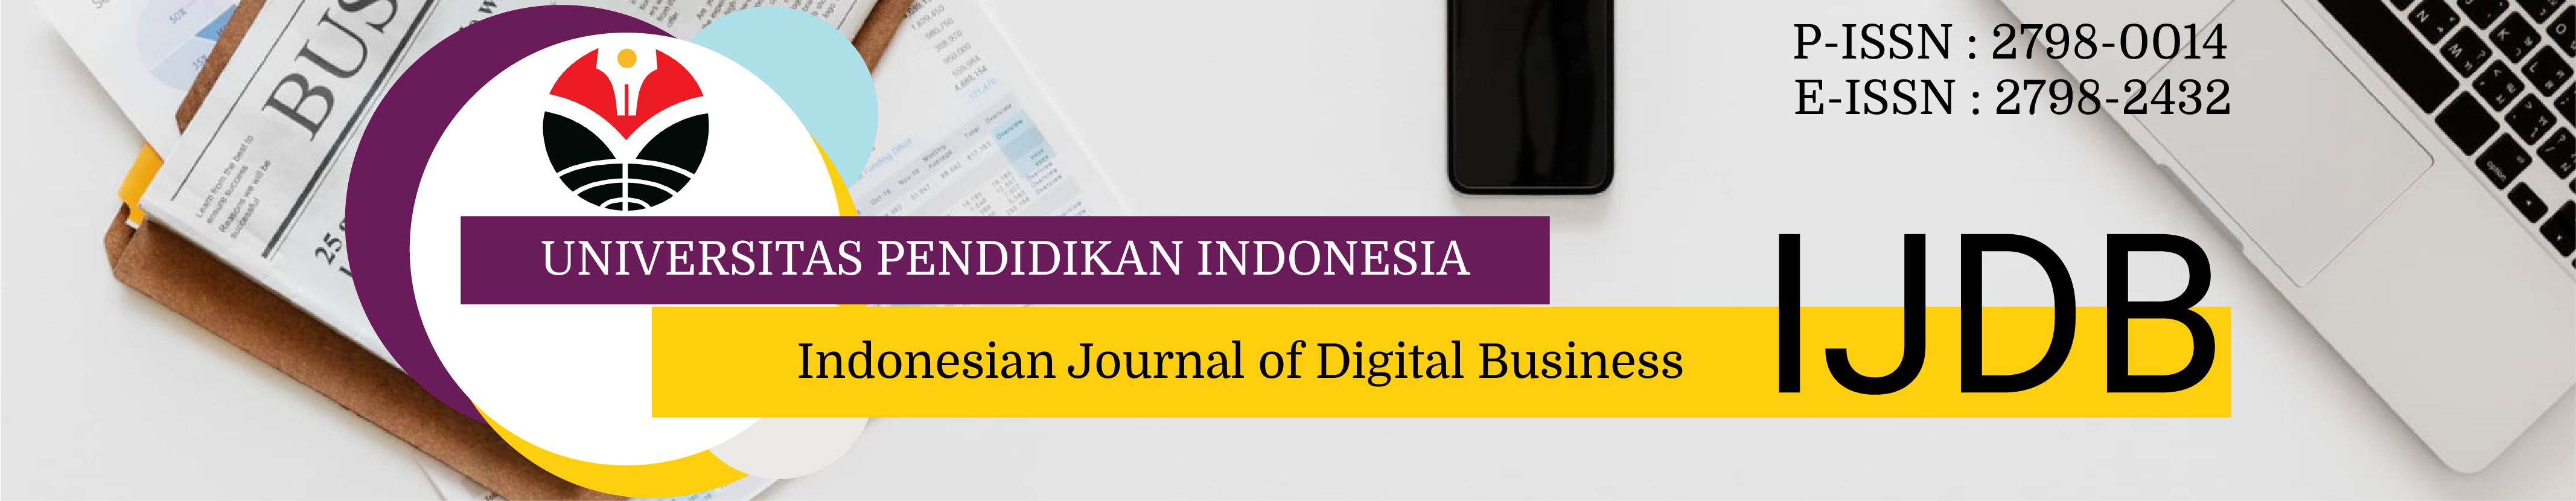 Indonesian Journal of Digital Business